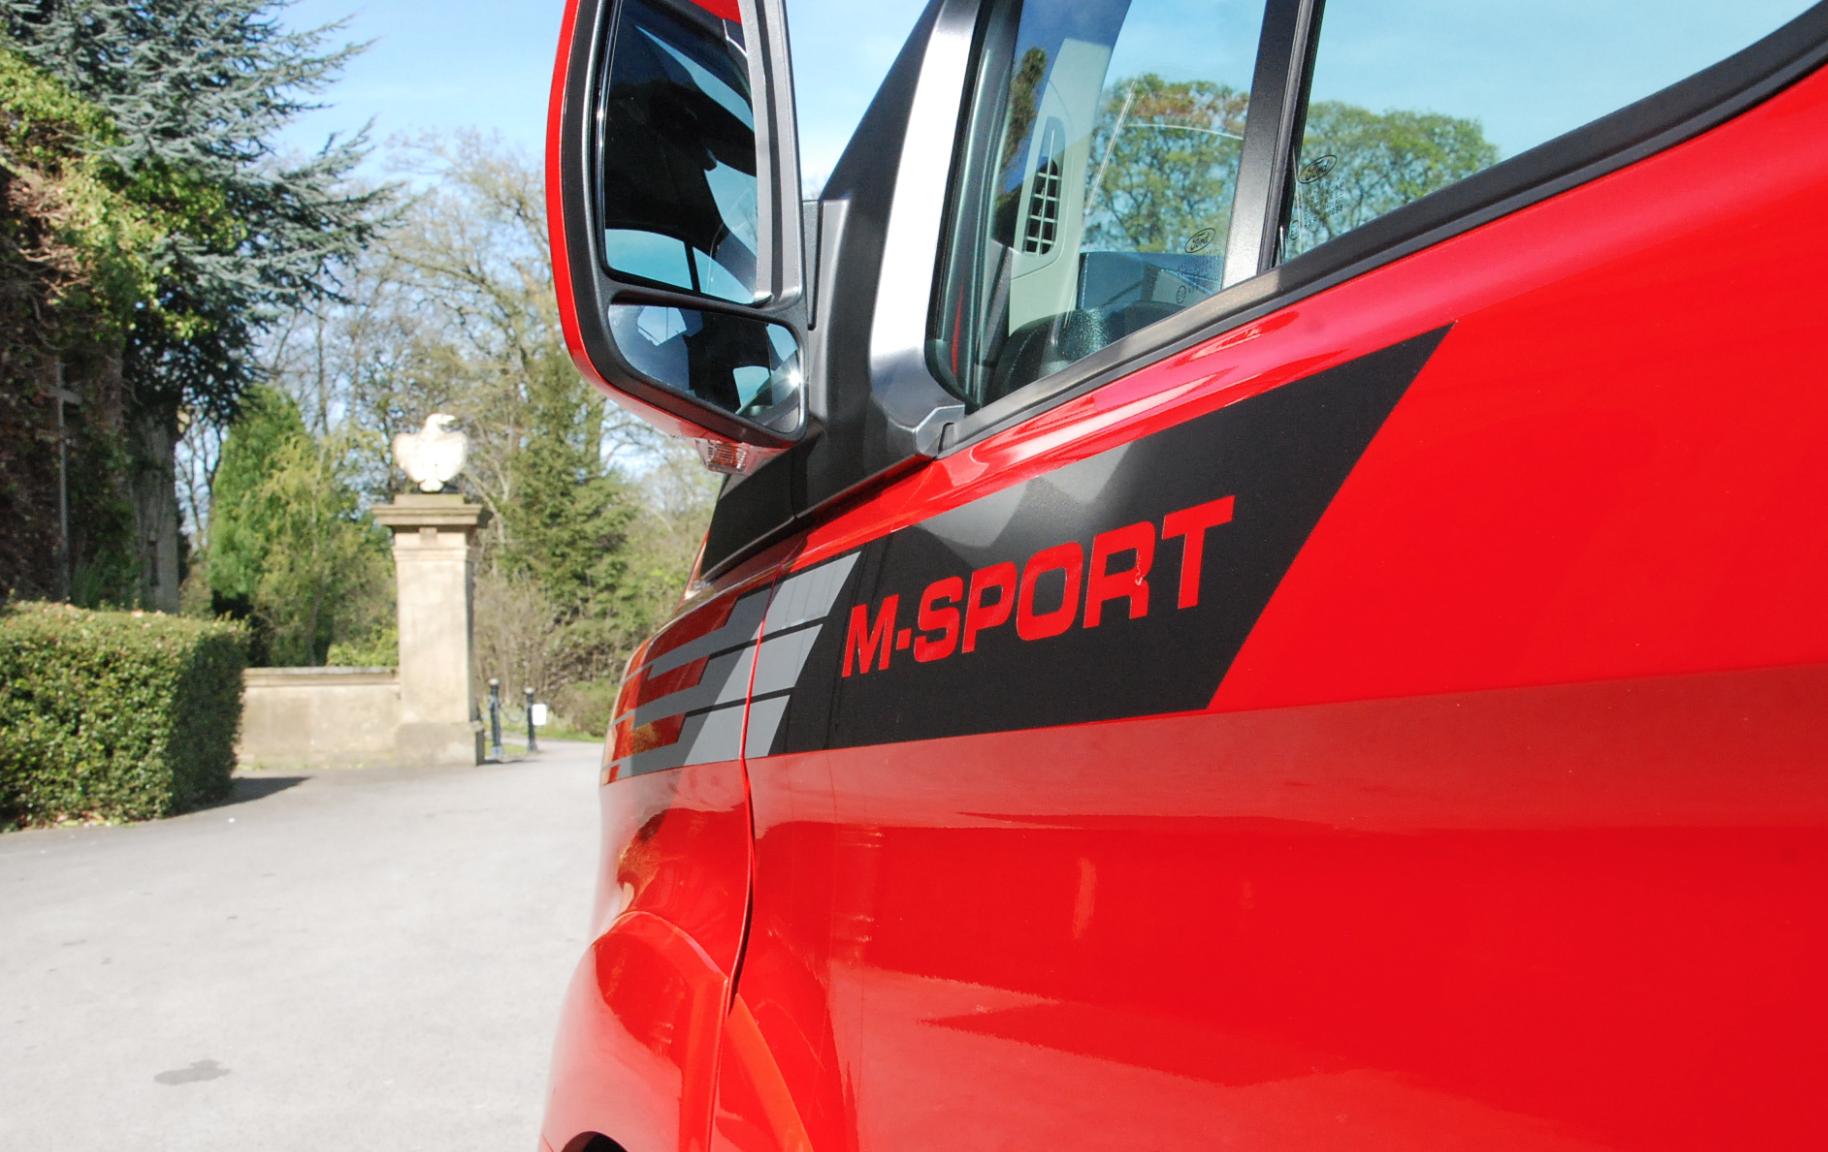 Ford Terrier M Sport - Mirror